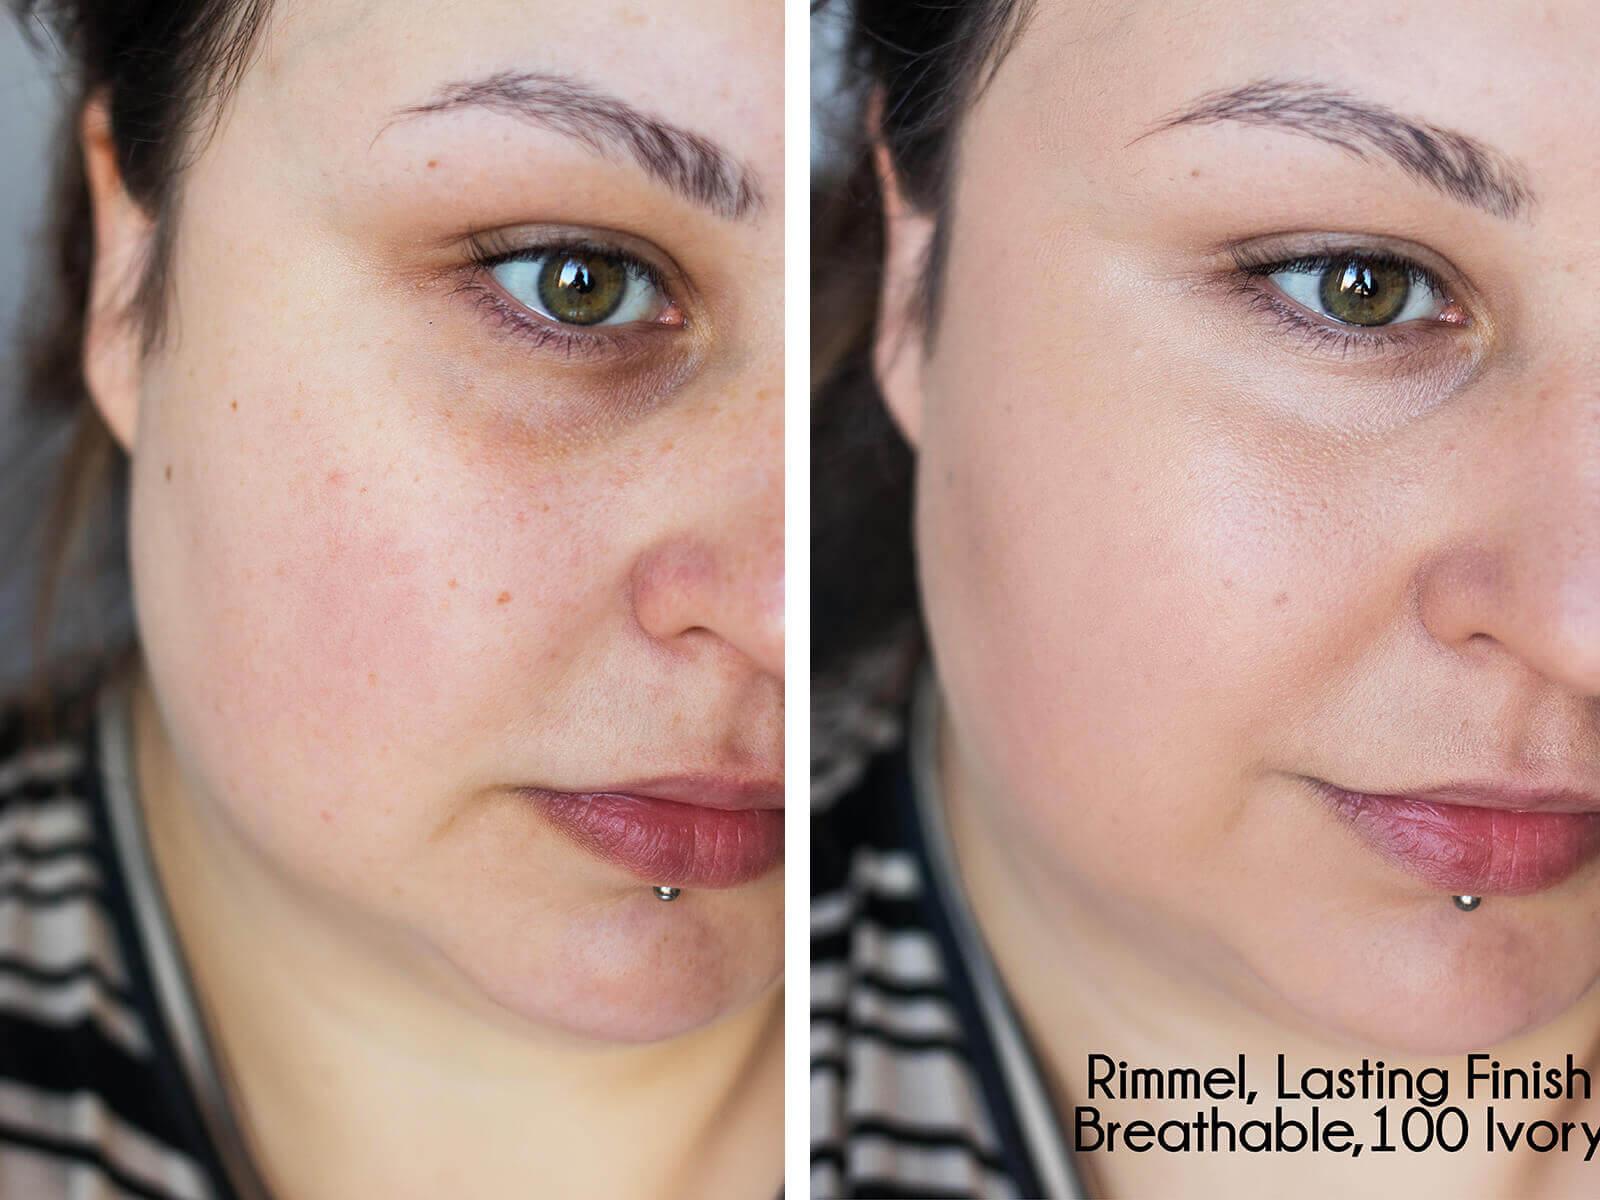 Rimmel Lasting Finish Breathable blog recenzja